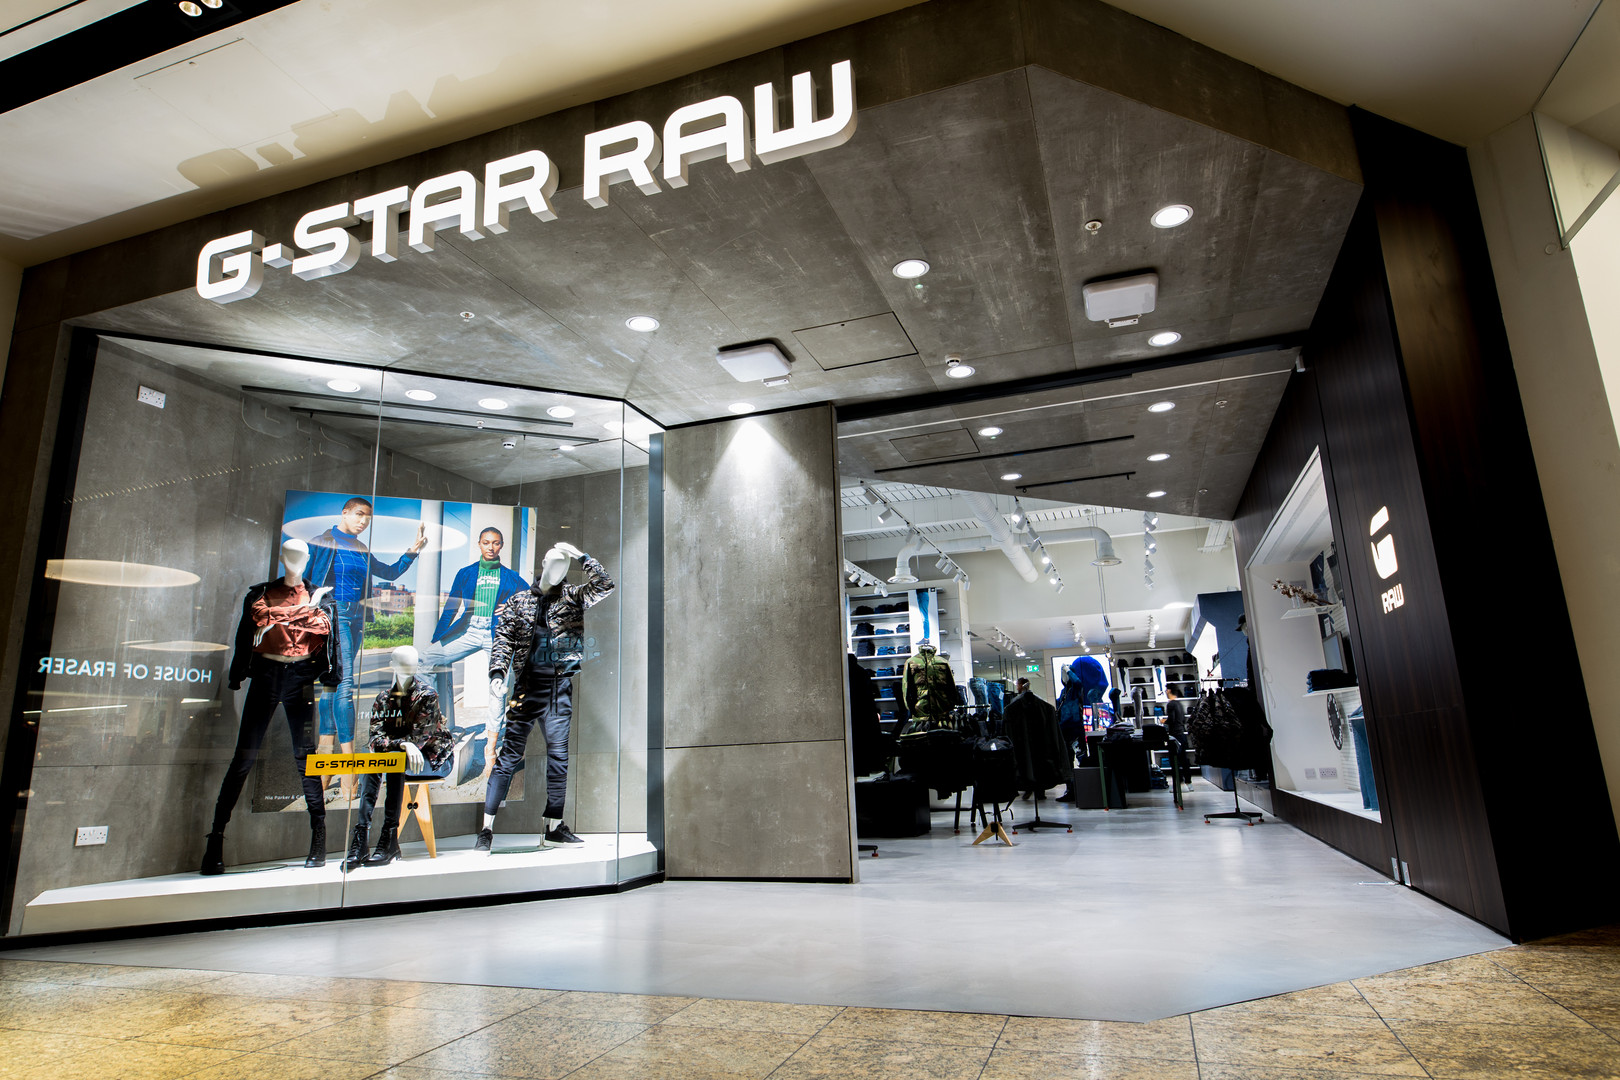 G star raw venue shoot meadowhall sheffield photographer